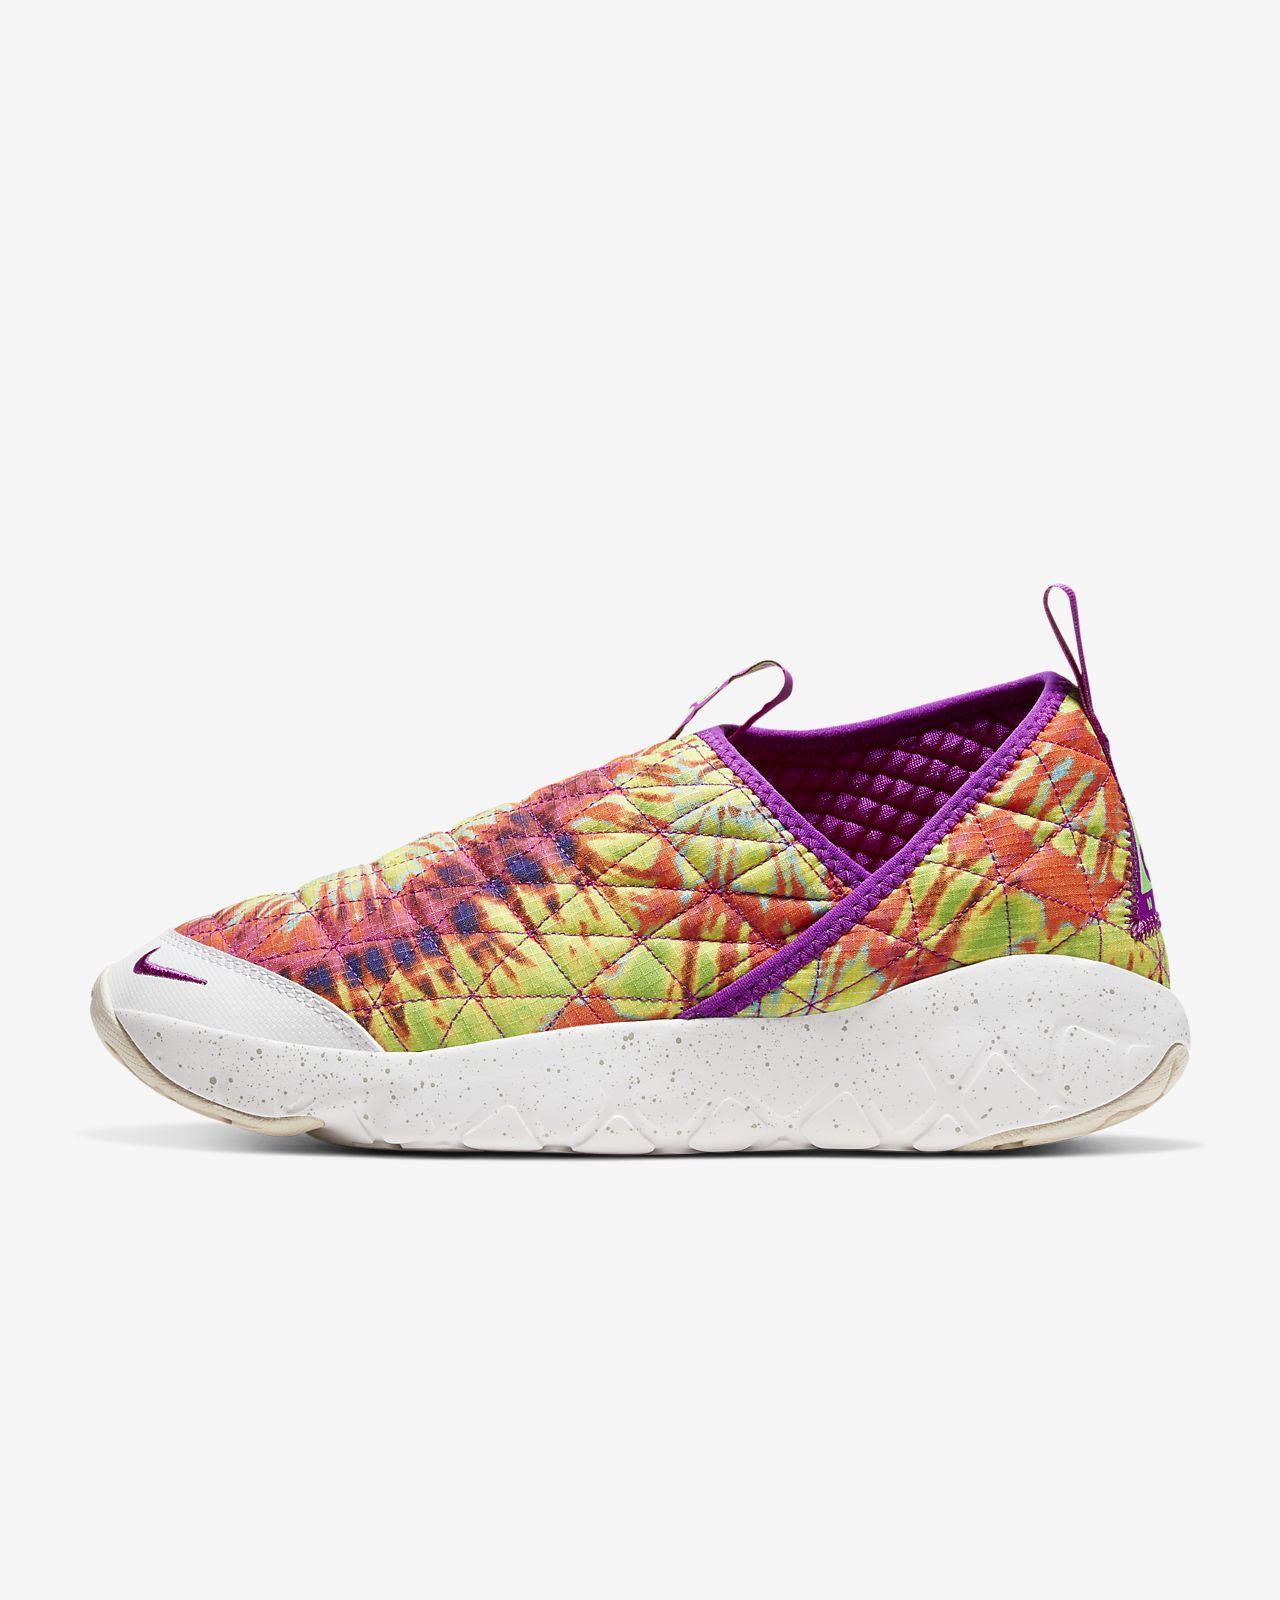 Nike ACG MOC 3.0 鞋款